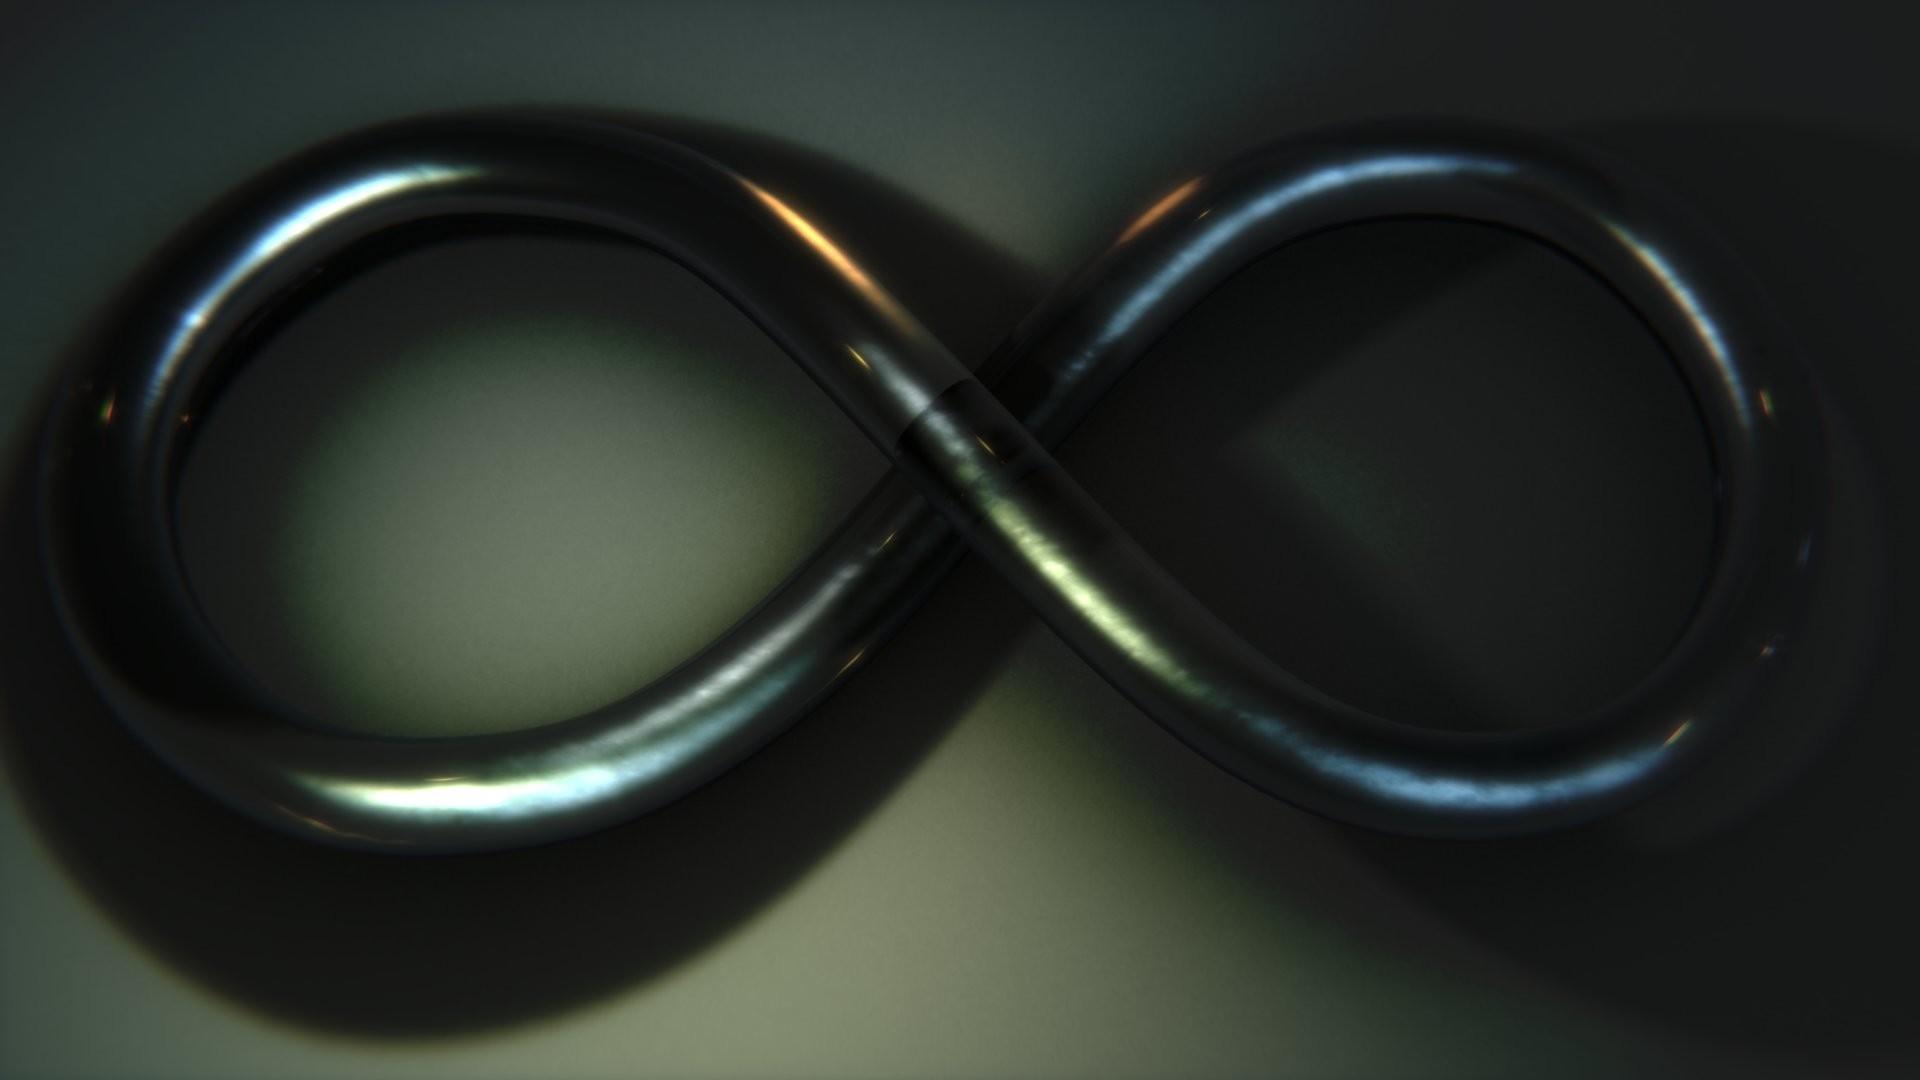 Infinity Infinity Wallpapers- screenshot Double Infinity Light Royalty-Free  Vector